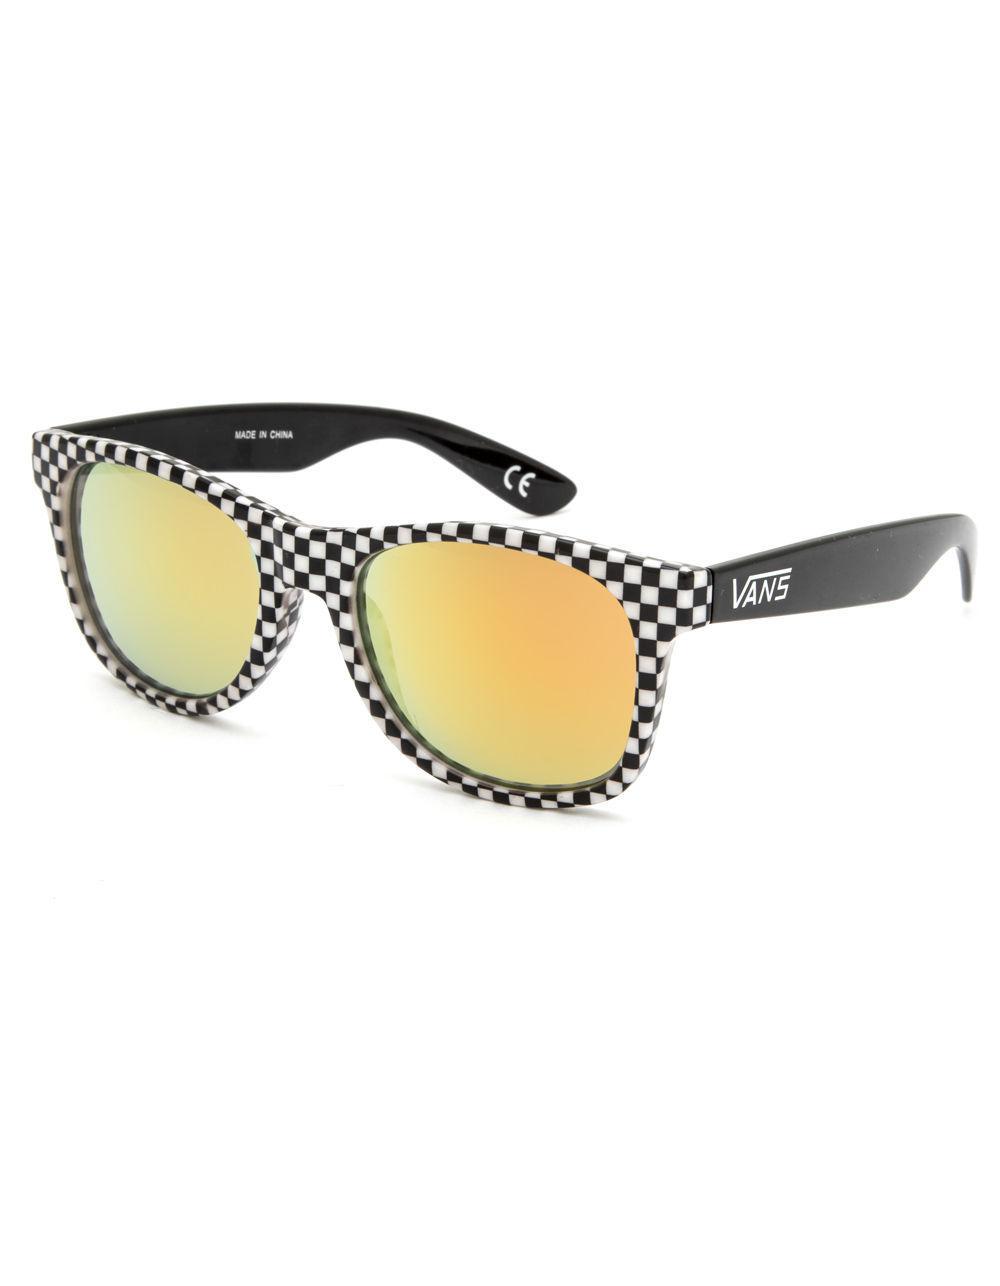 7b63b6fd165 Lyst - Vans Spicoli 4 Checkered Sunglasses for Men